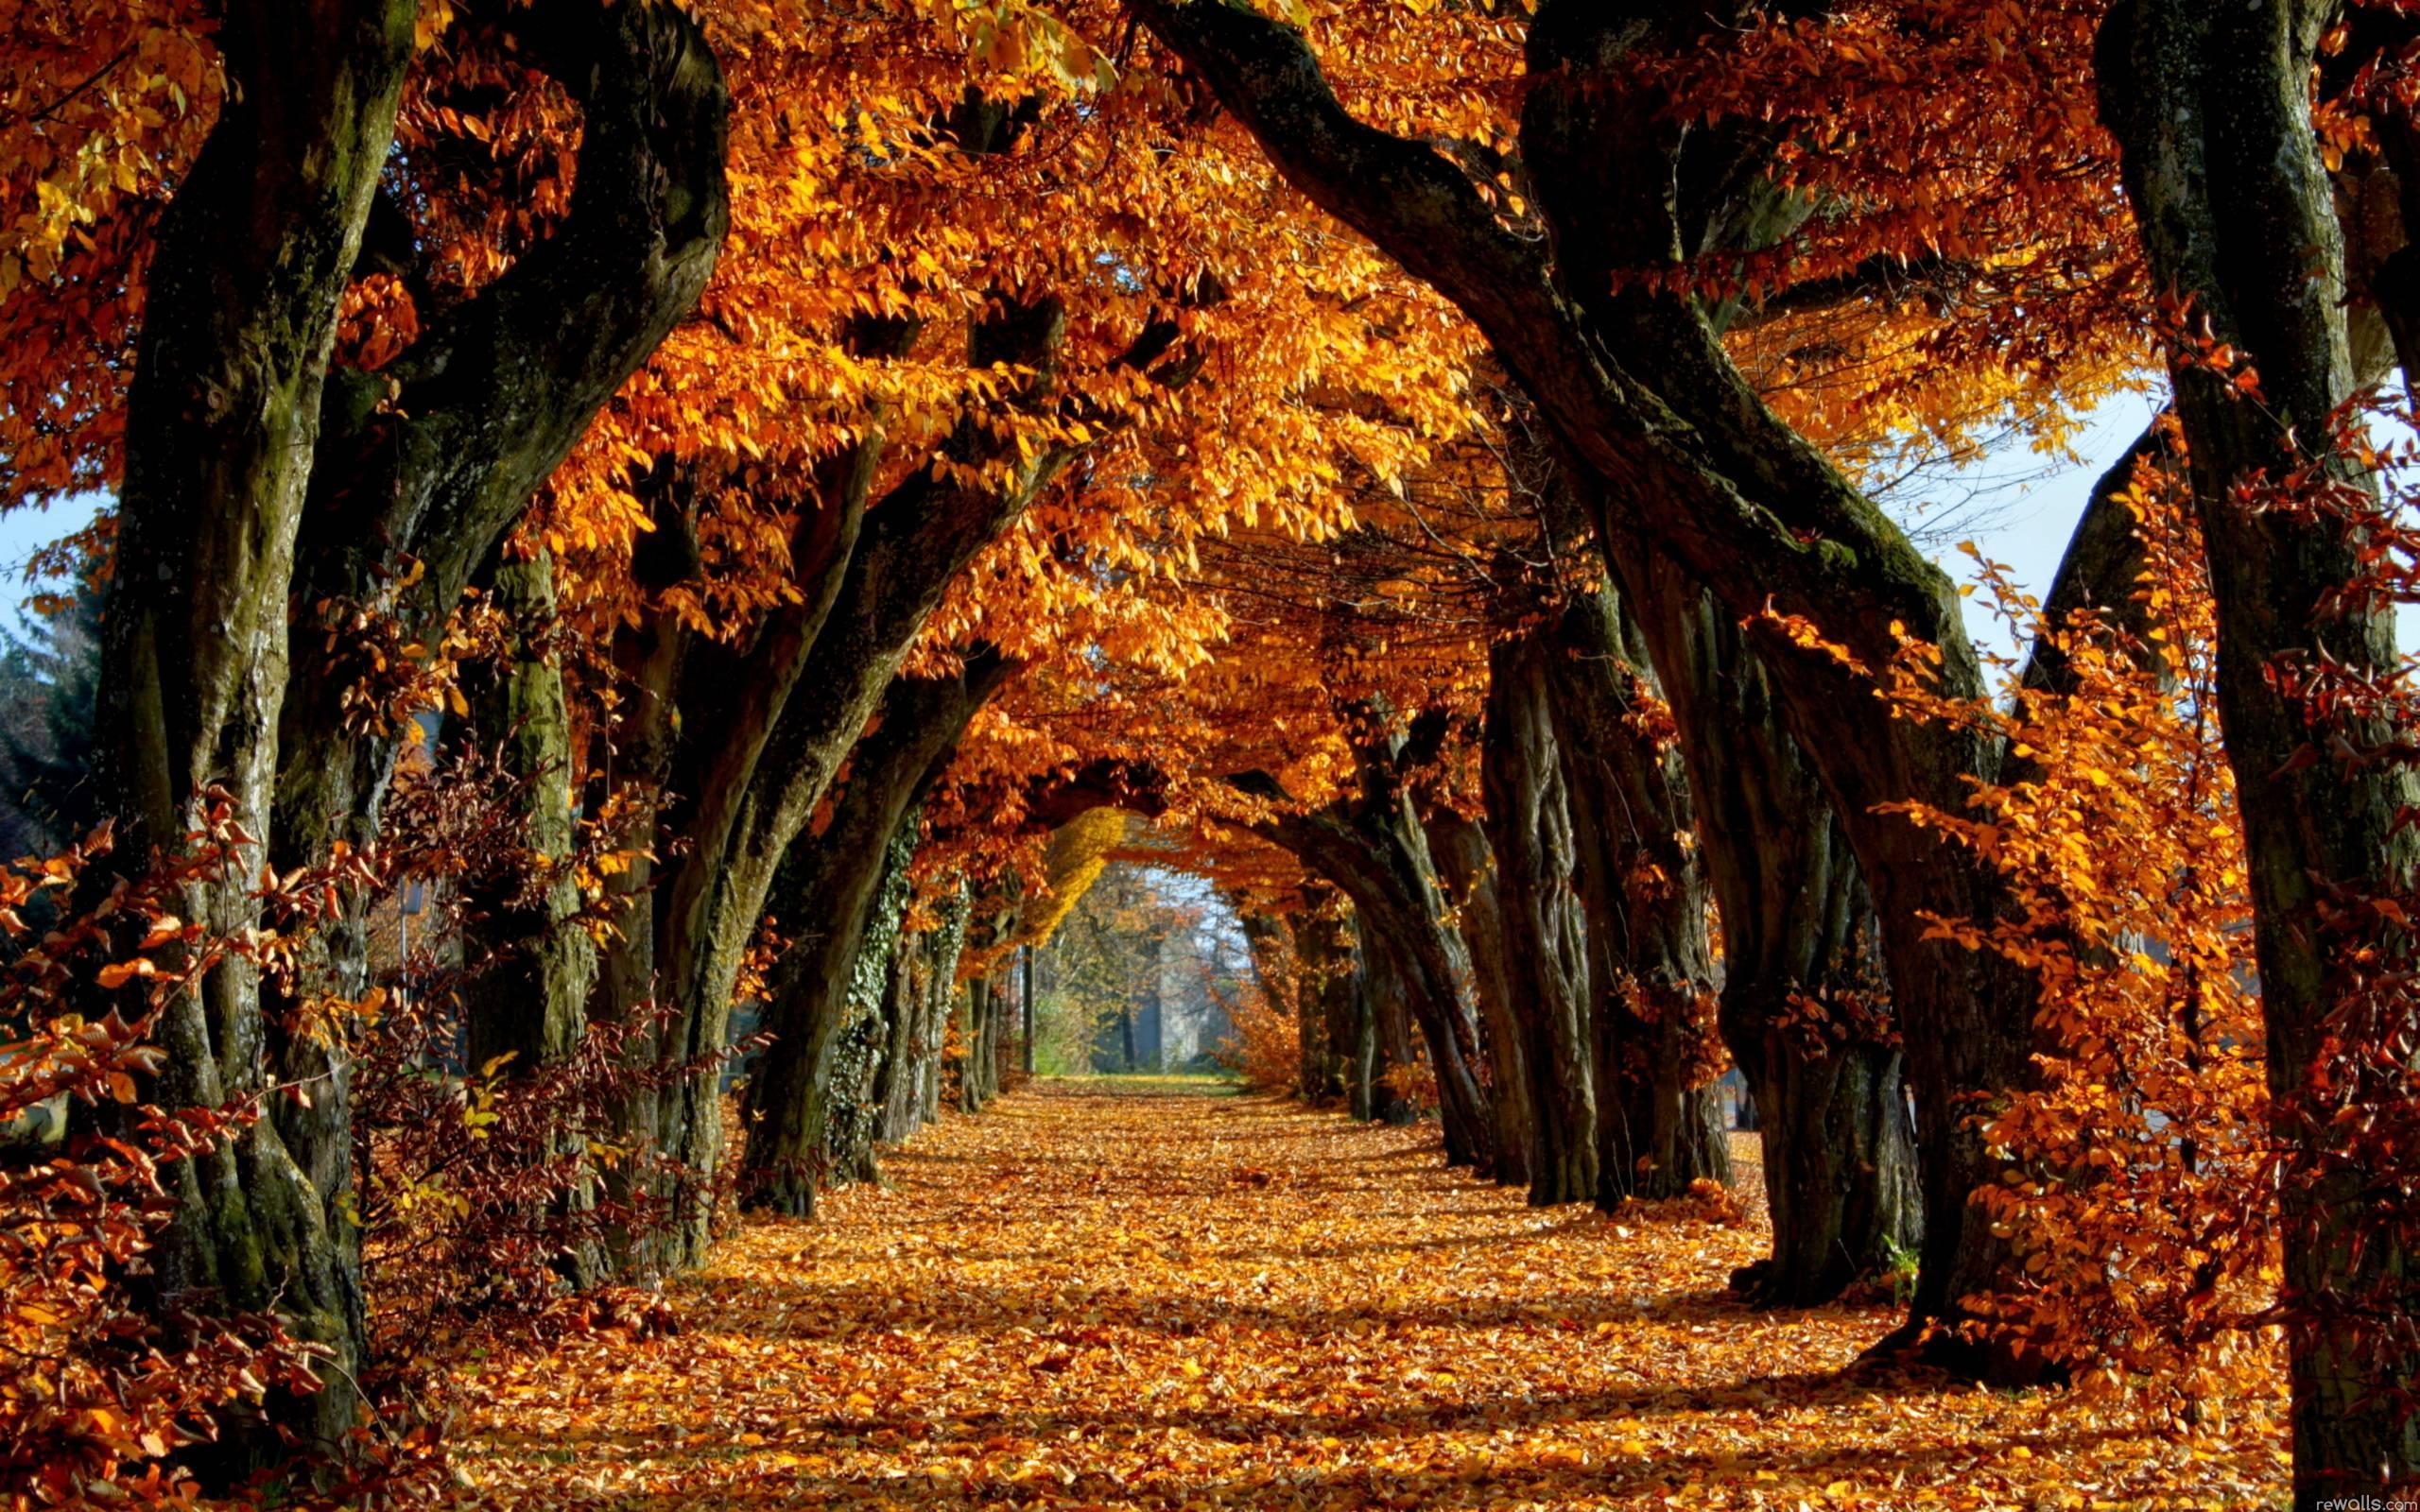 Hd Wallpaper Nature Fall 3